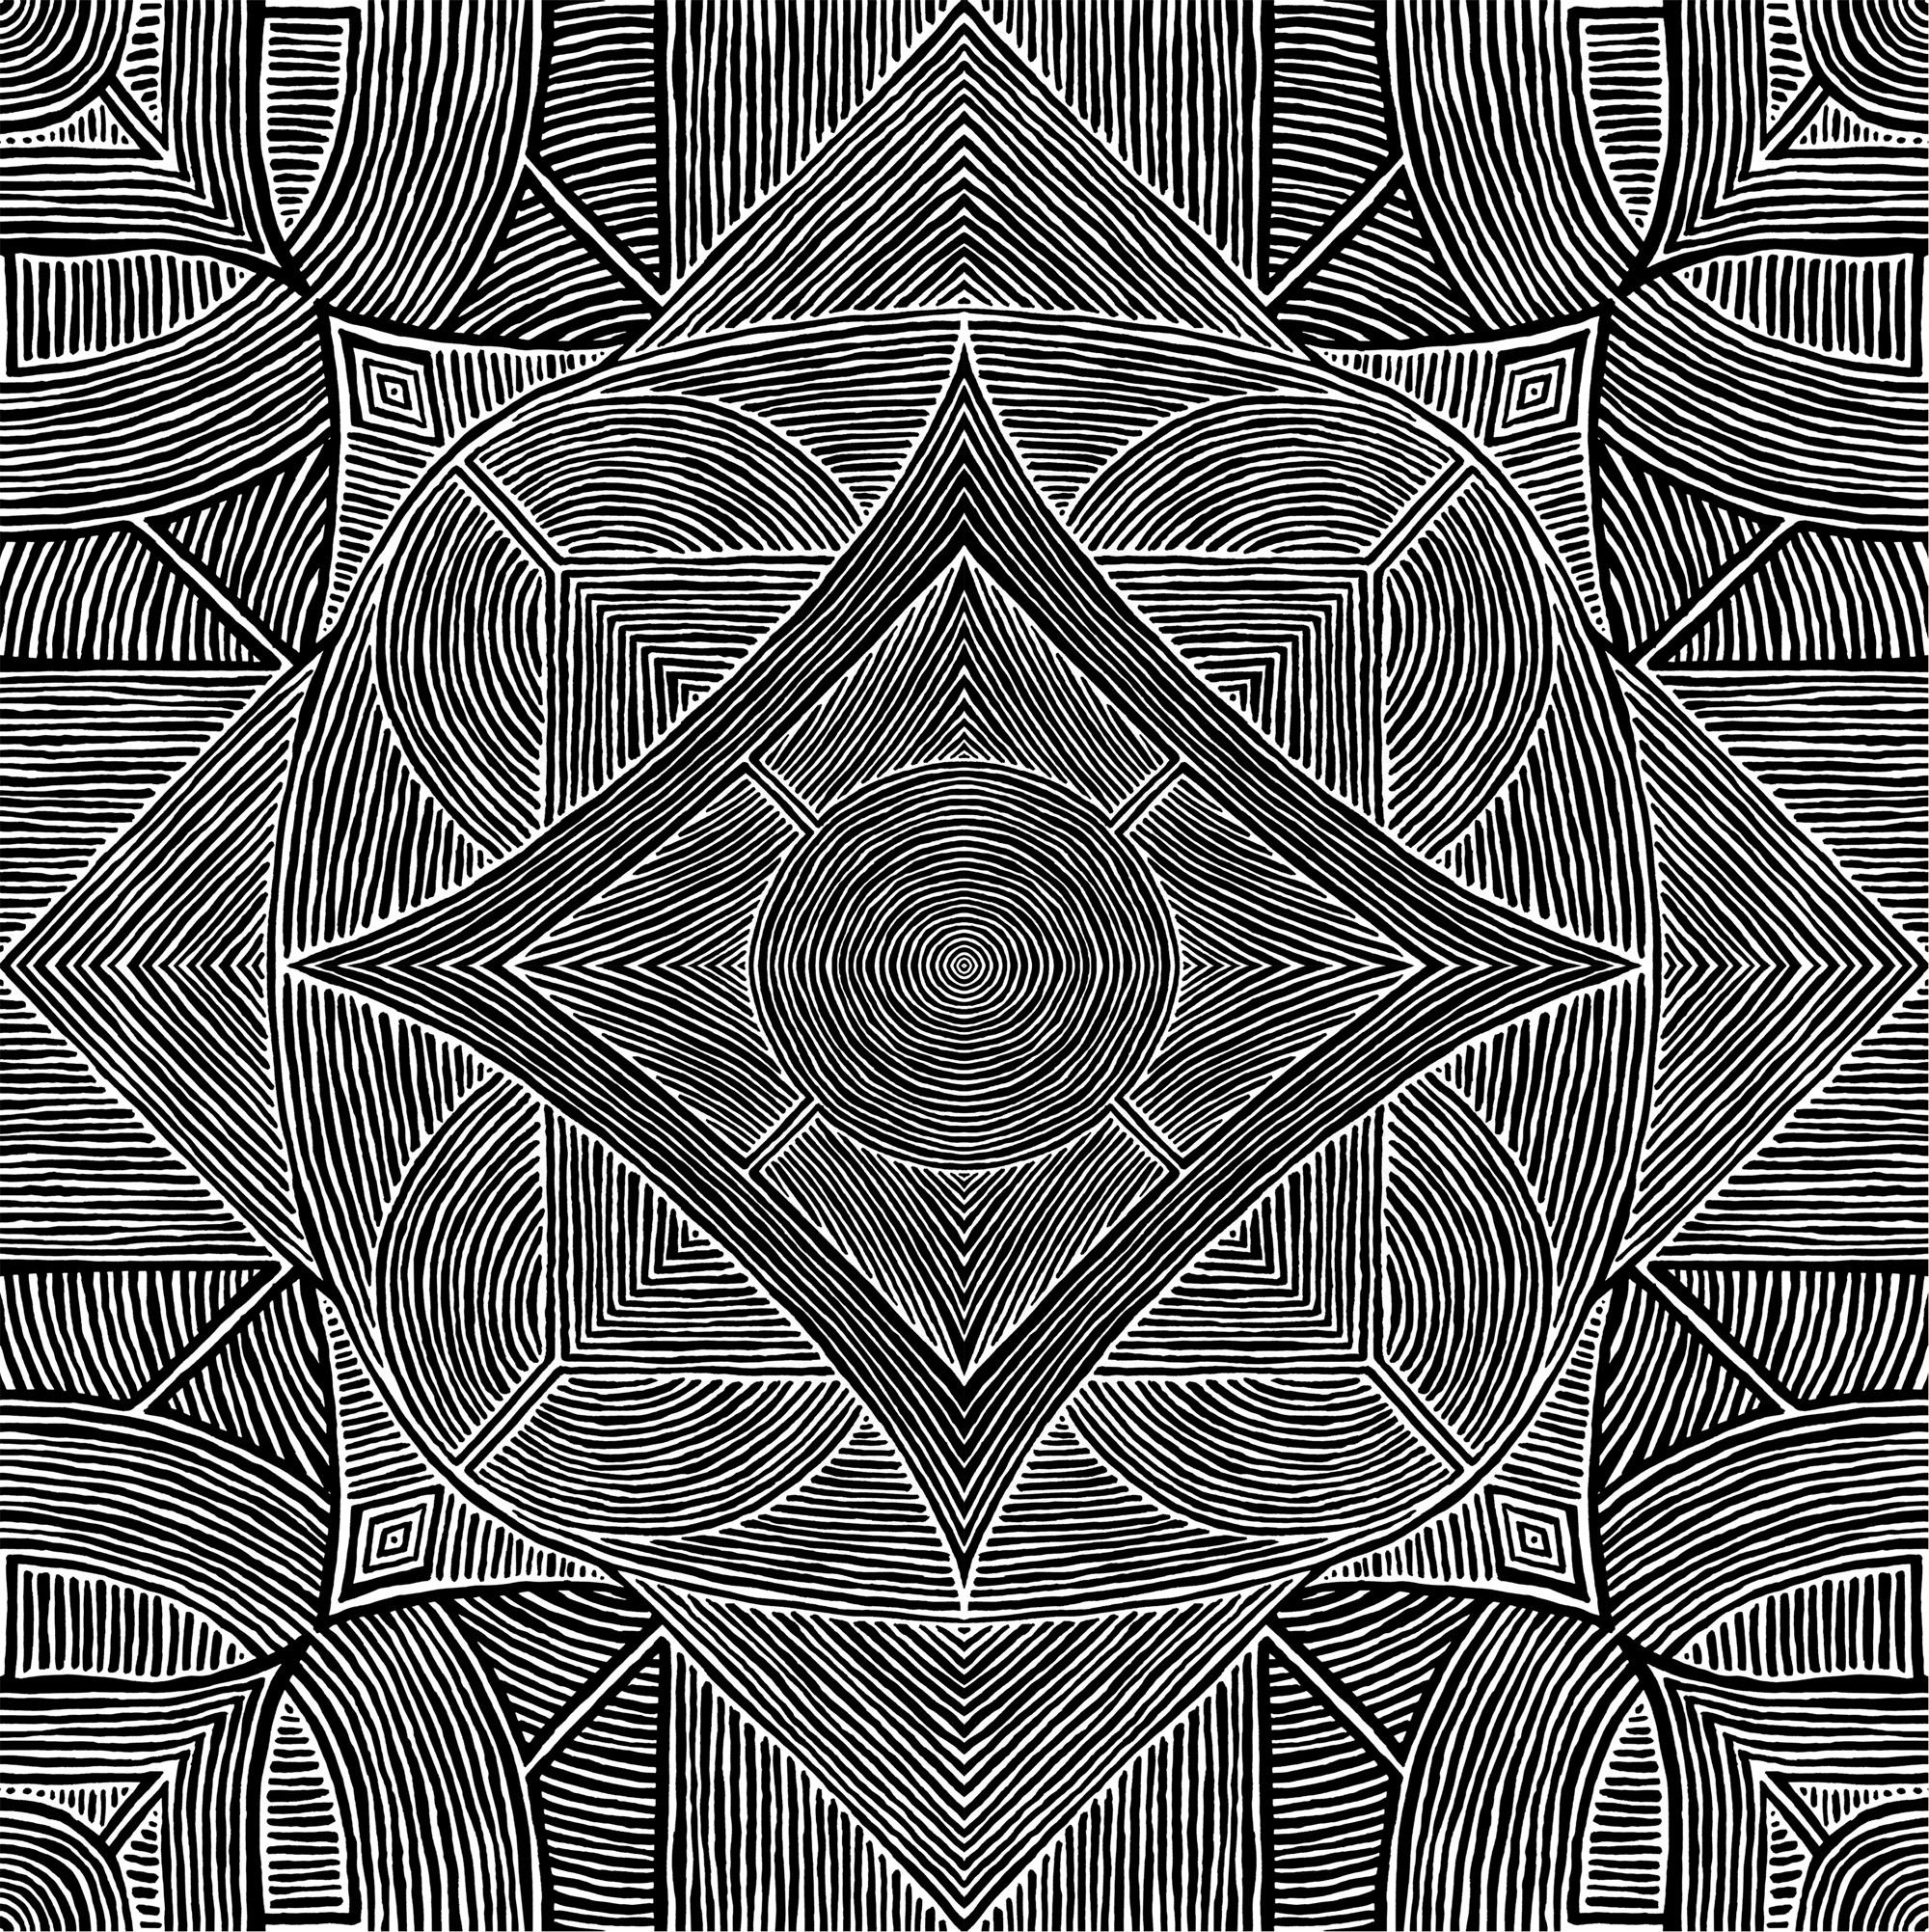 mandala-marker-levels-back